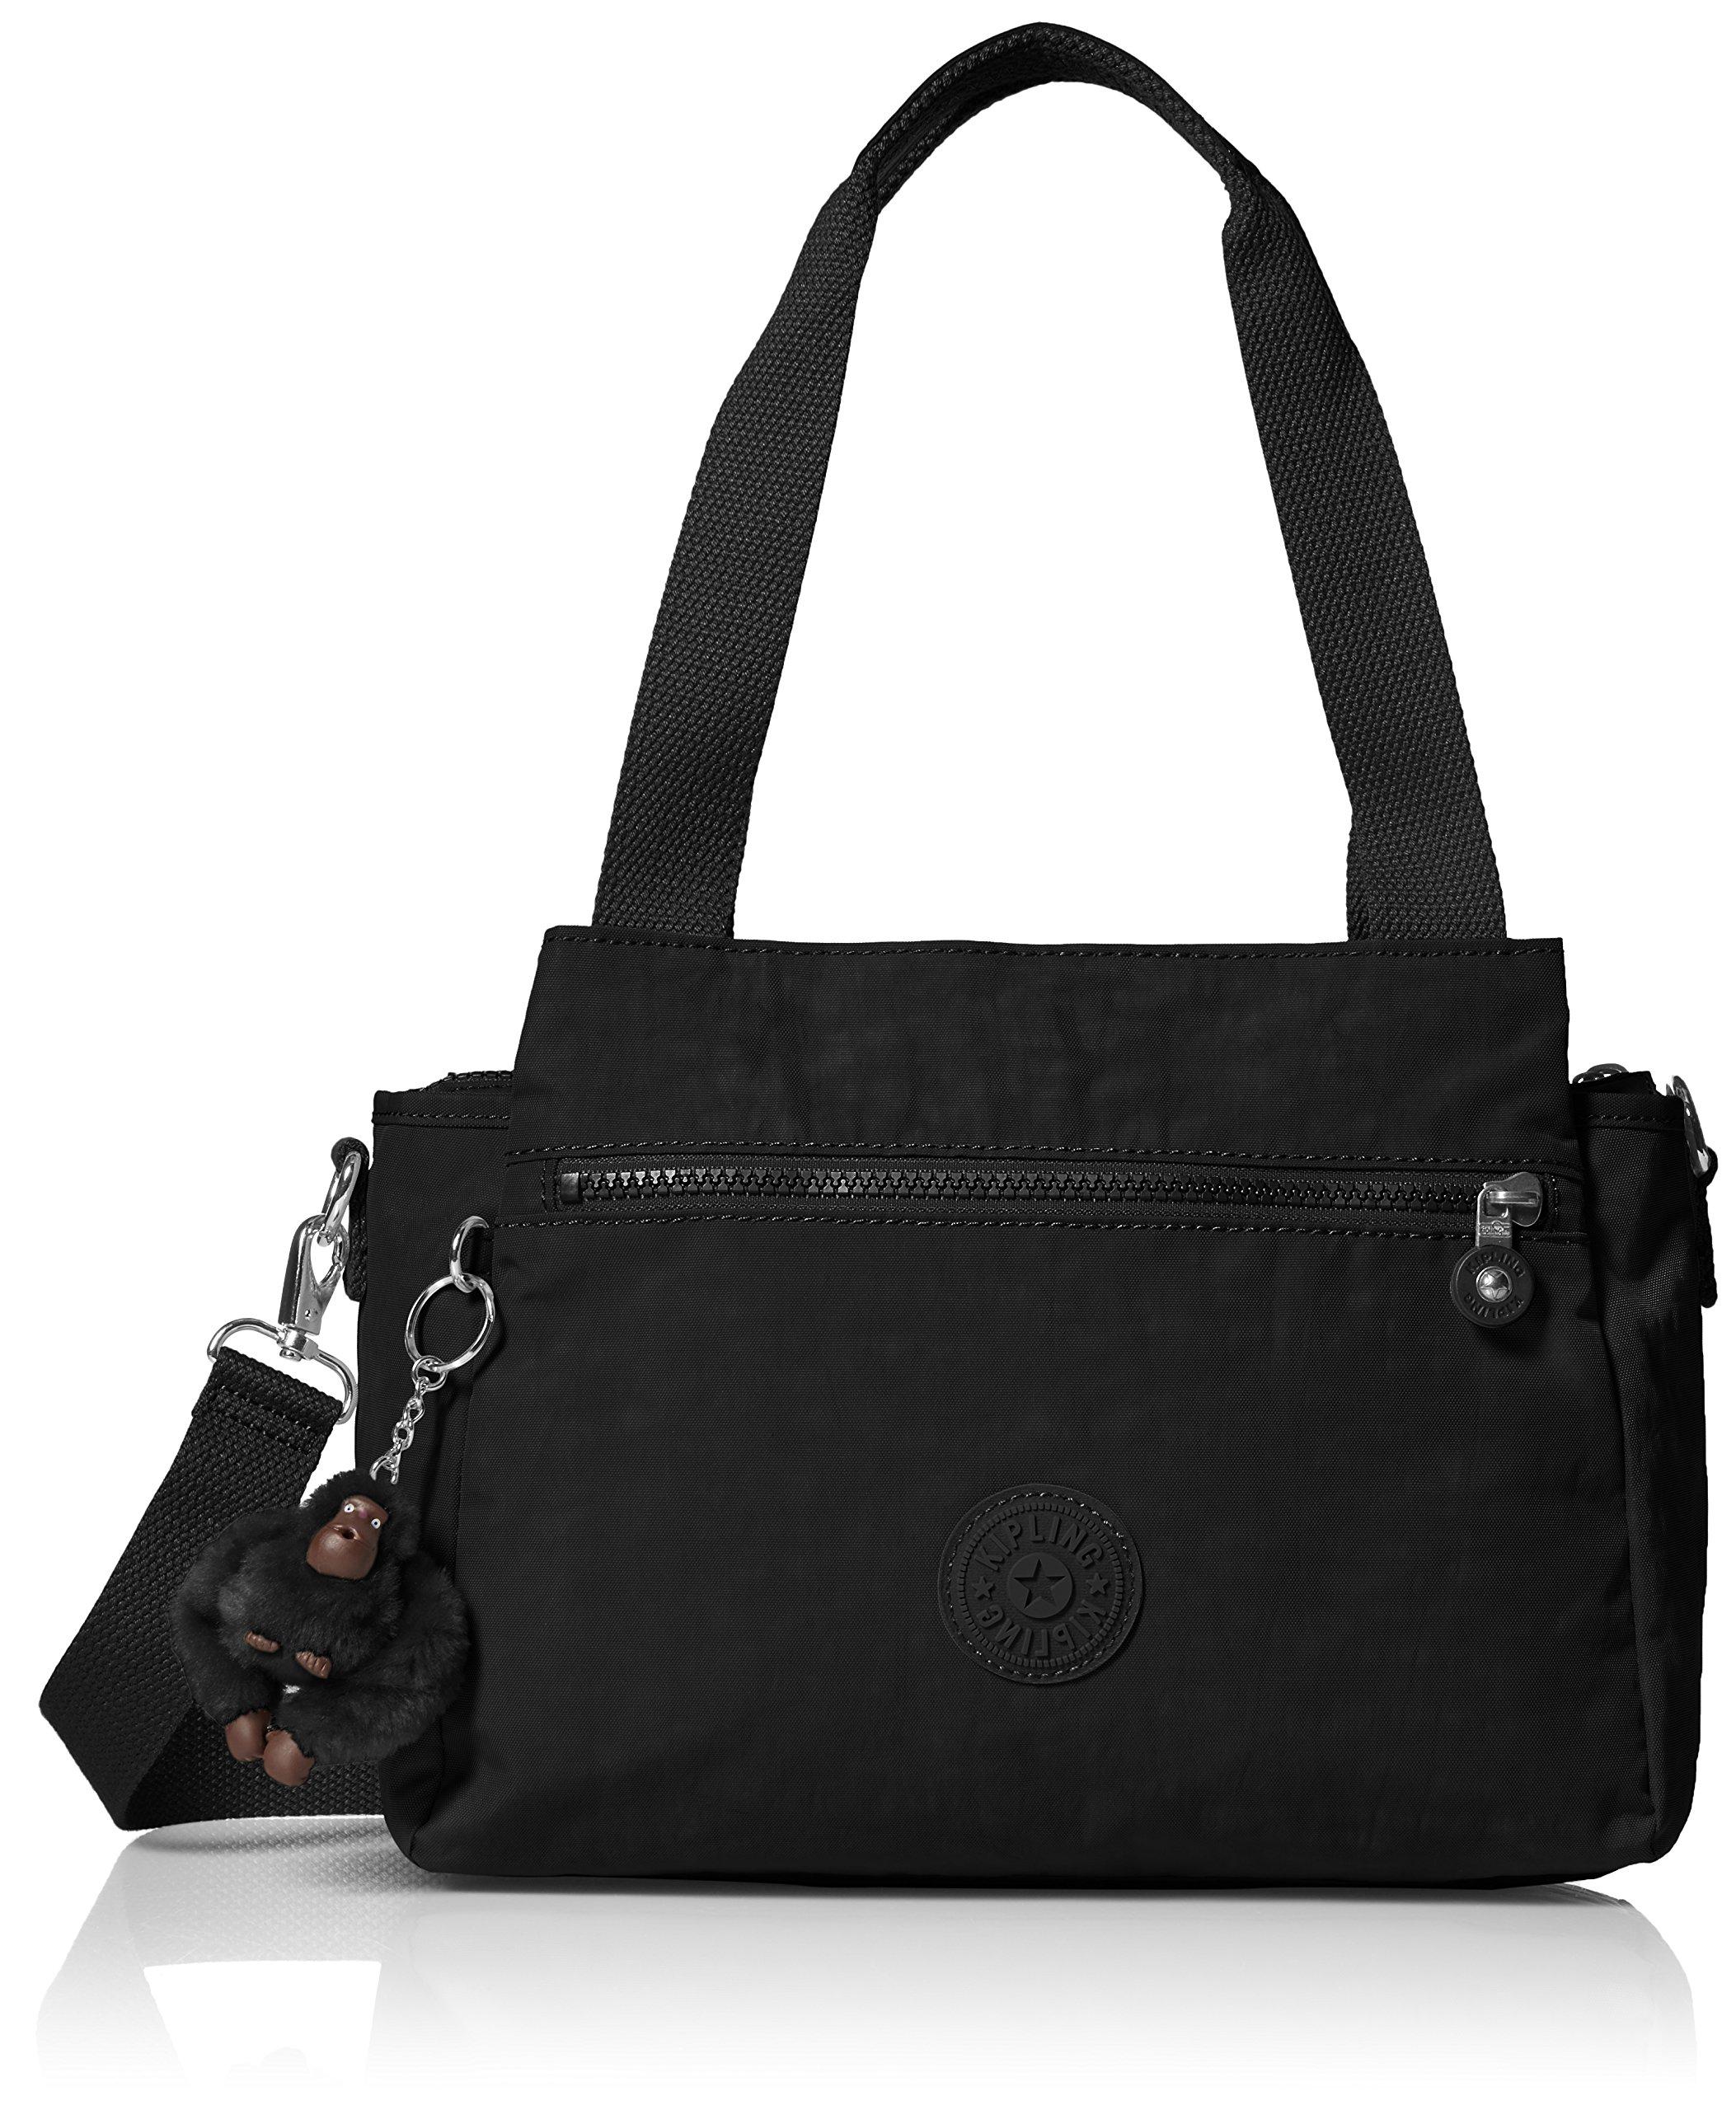 Kipling Elysia Black Tonal Handbag t